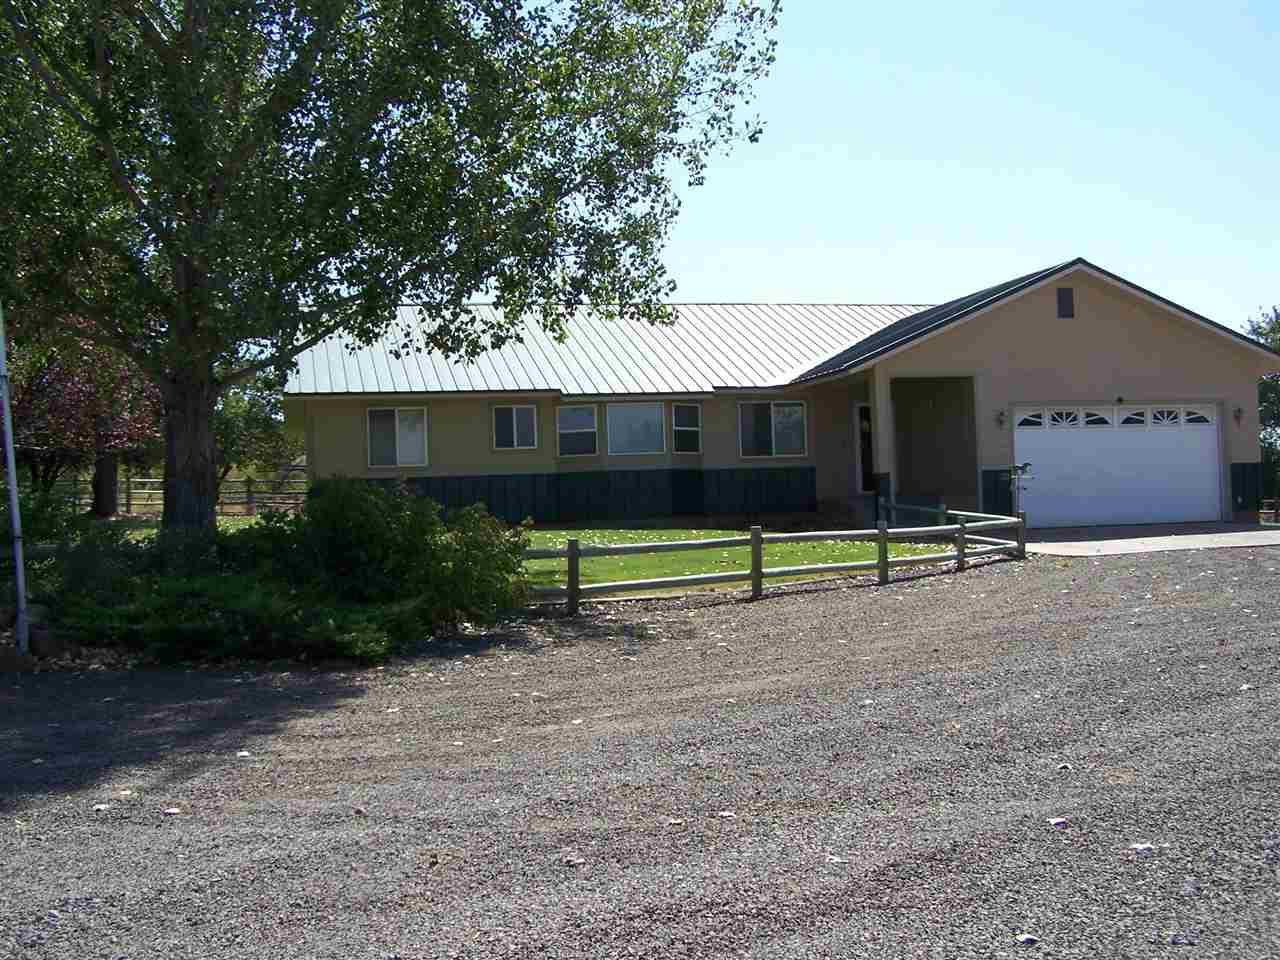 独户住宅 为 销售 在 1861 Valley View Road 1861 Valley View Road Council, 爱达荷州 83612